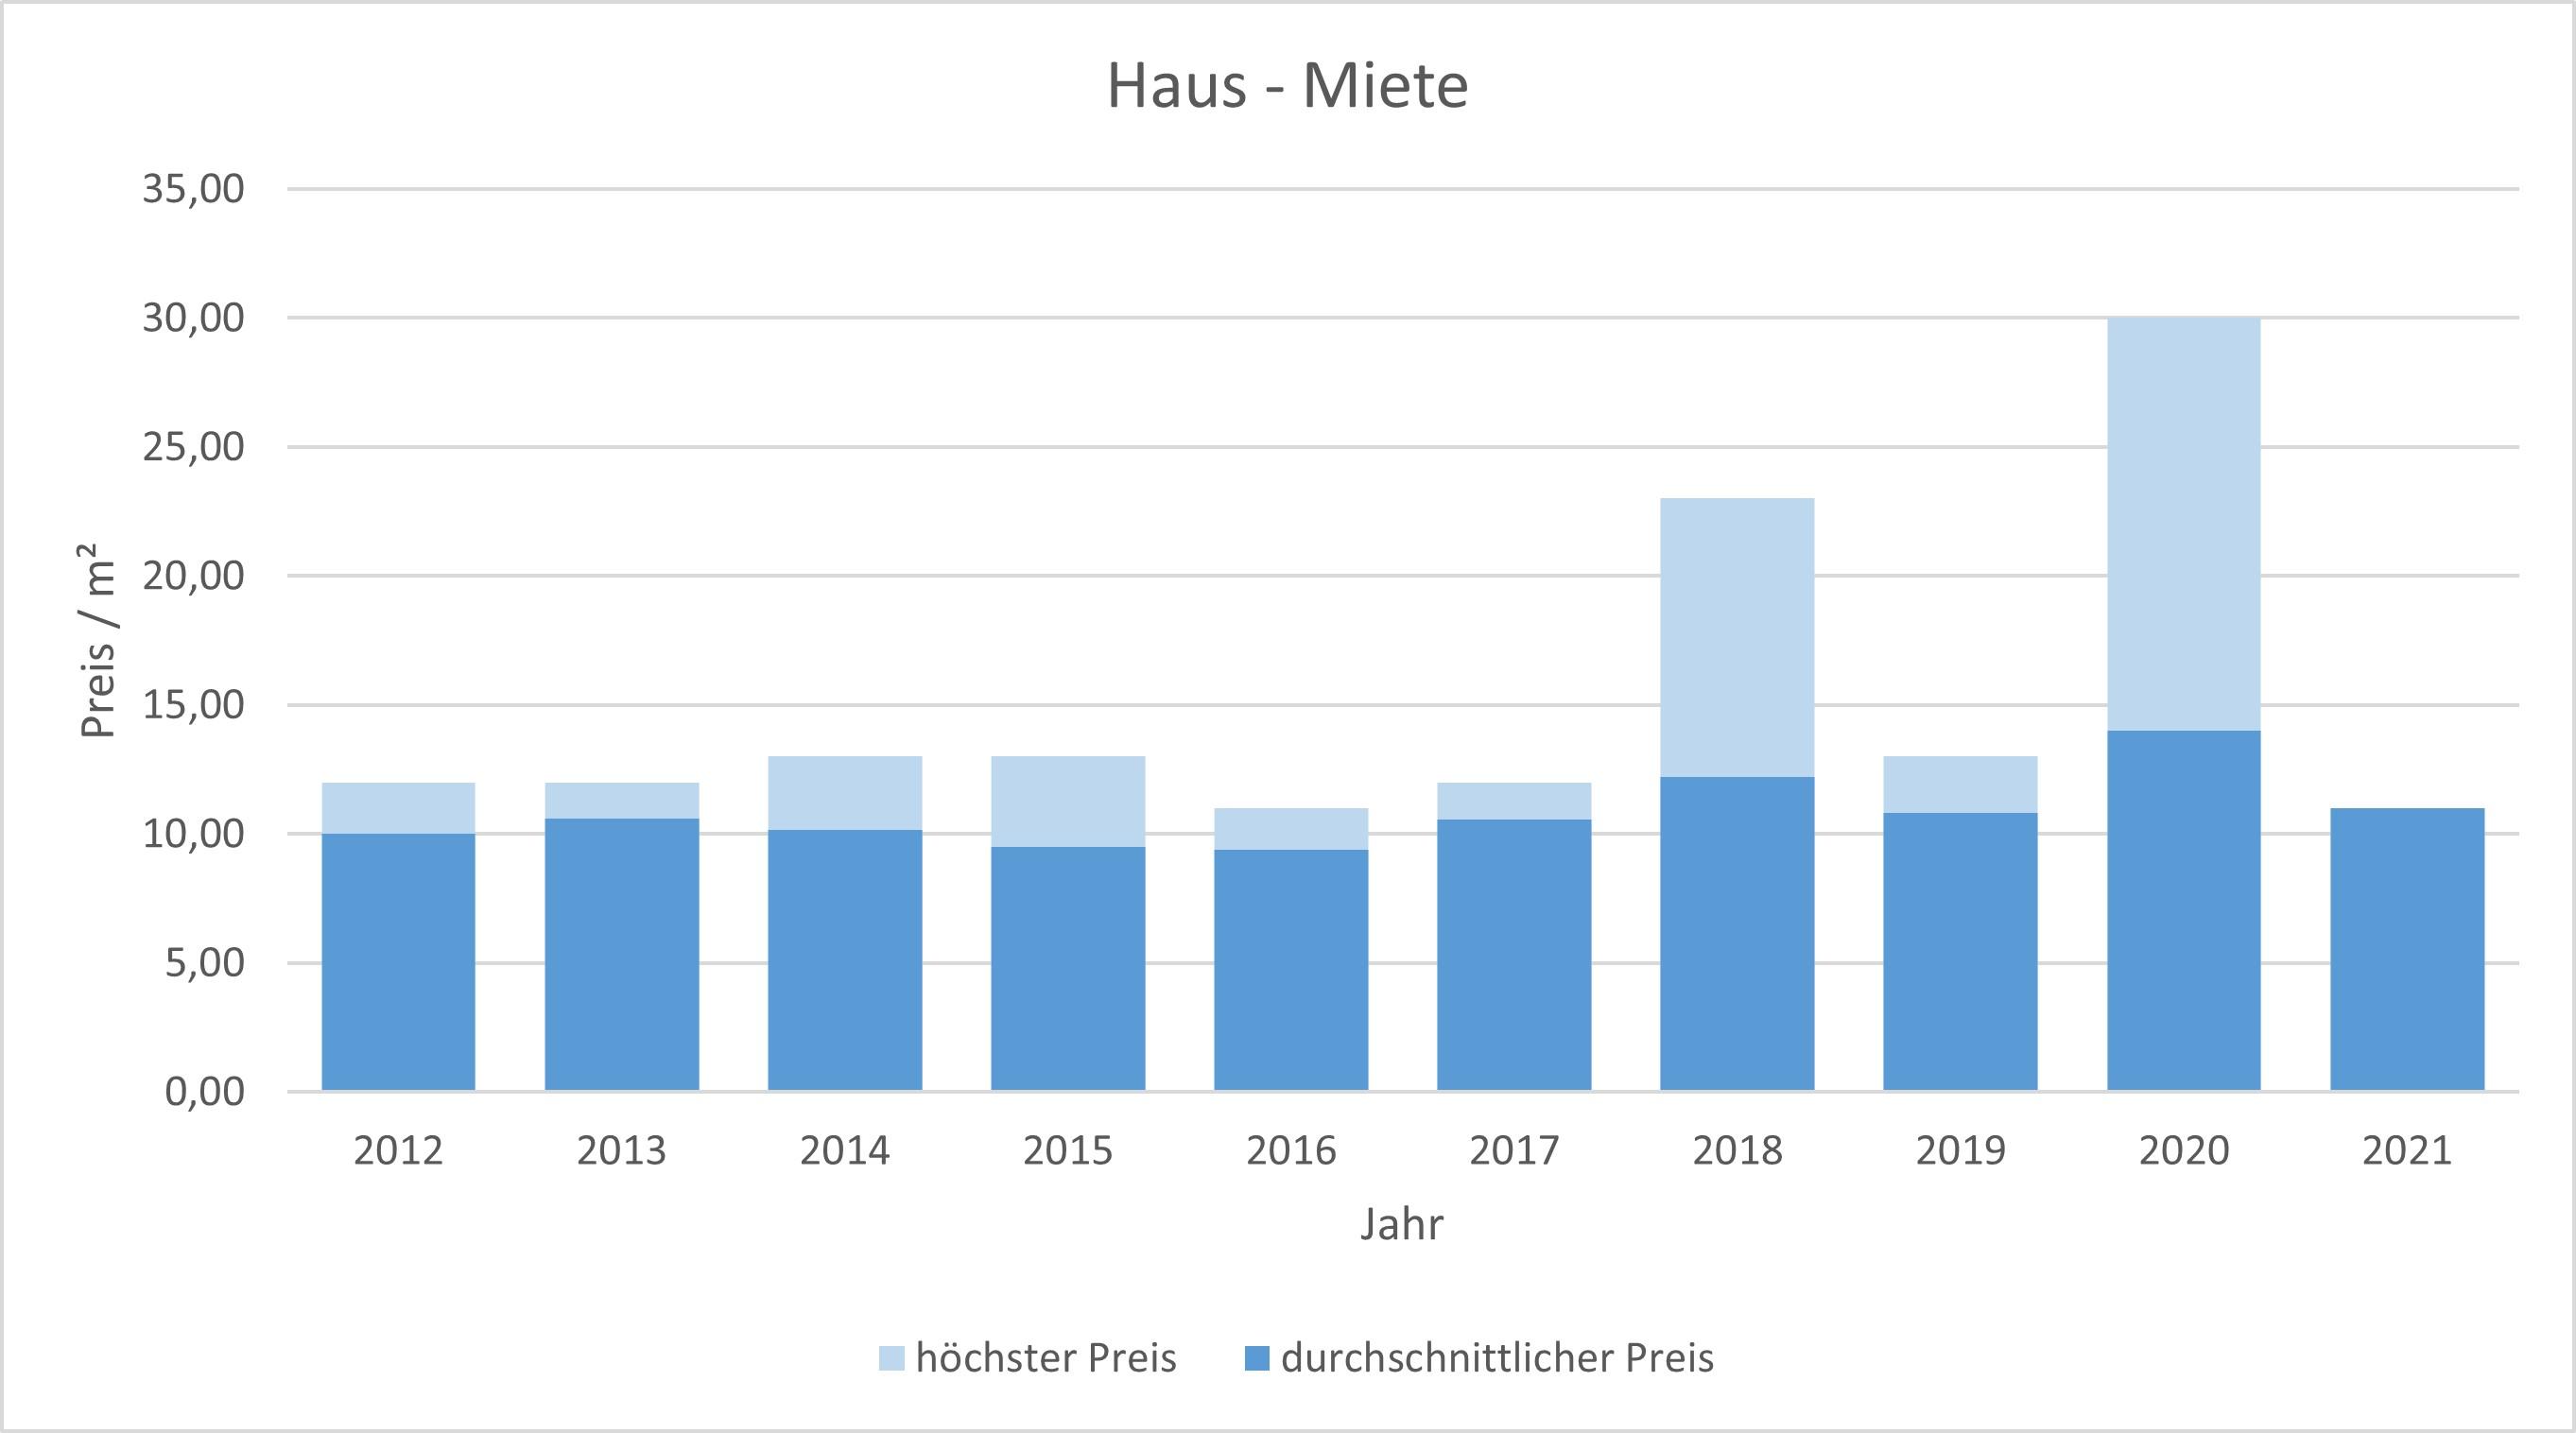 Glonn Haus mieten vermieten Preis Bewertung Makler www.happy-immo.de  2019 2020 2021